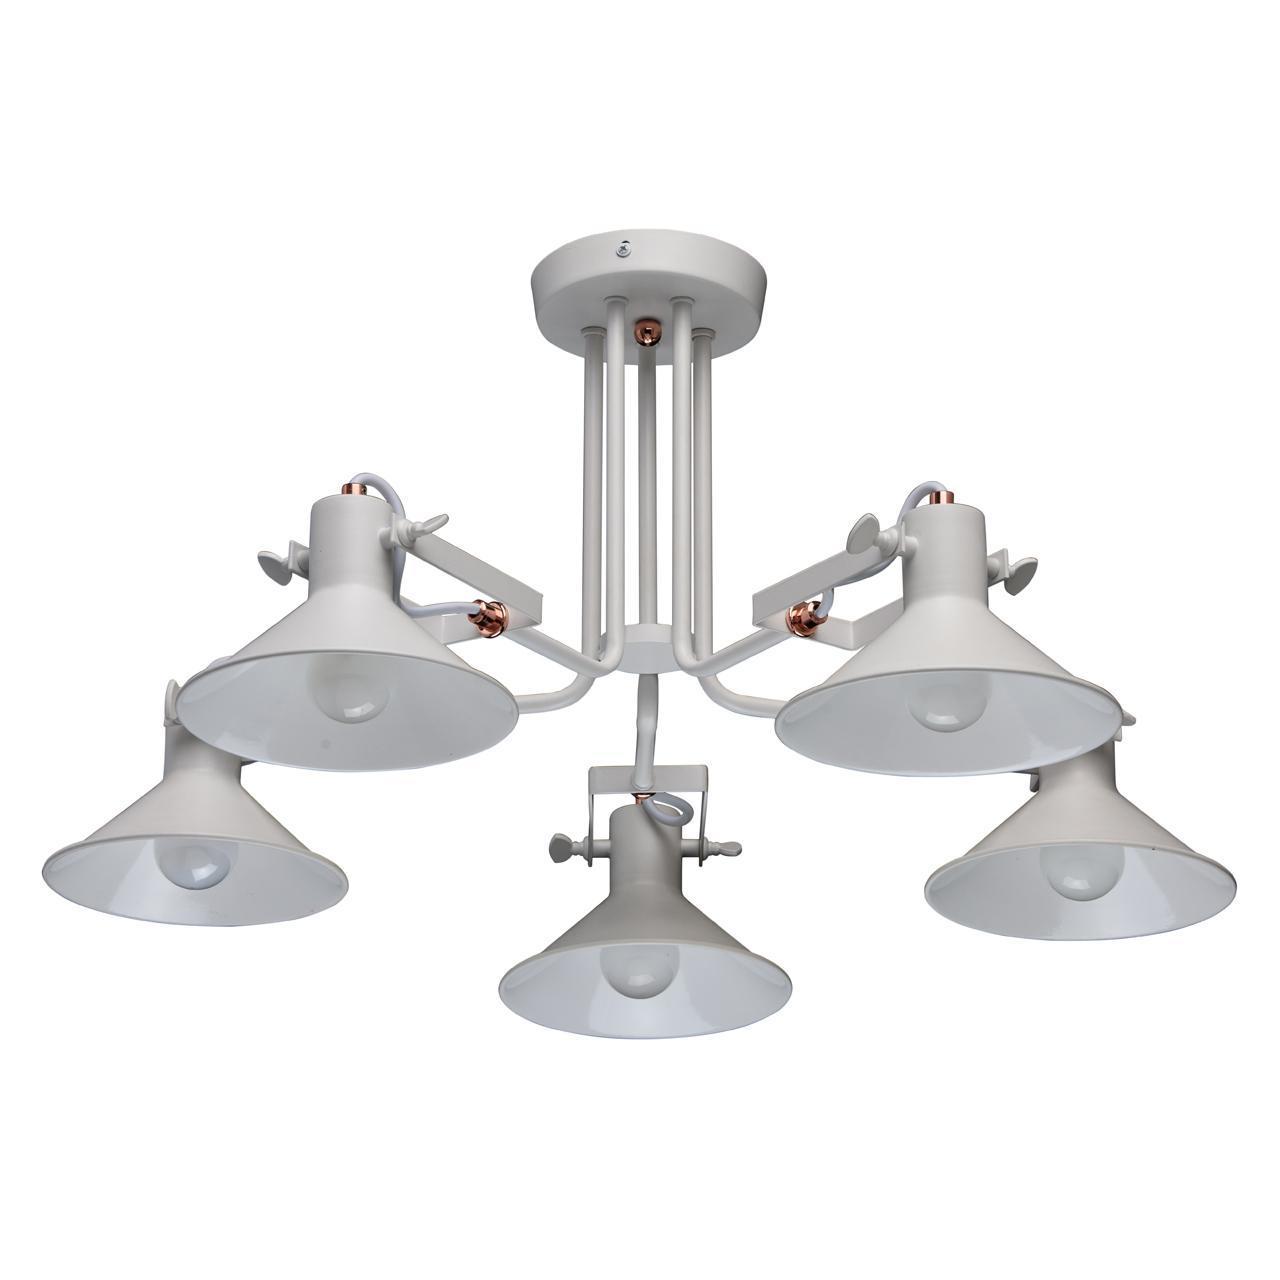 Люстра MW-Light ДаунТаун 3 691010705 потолочная цена 2017